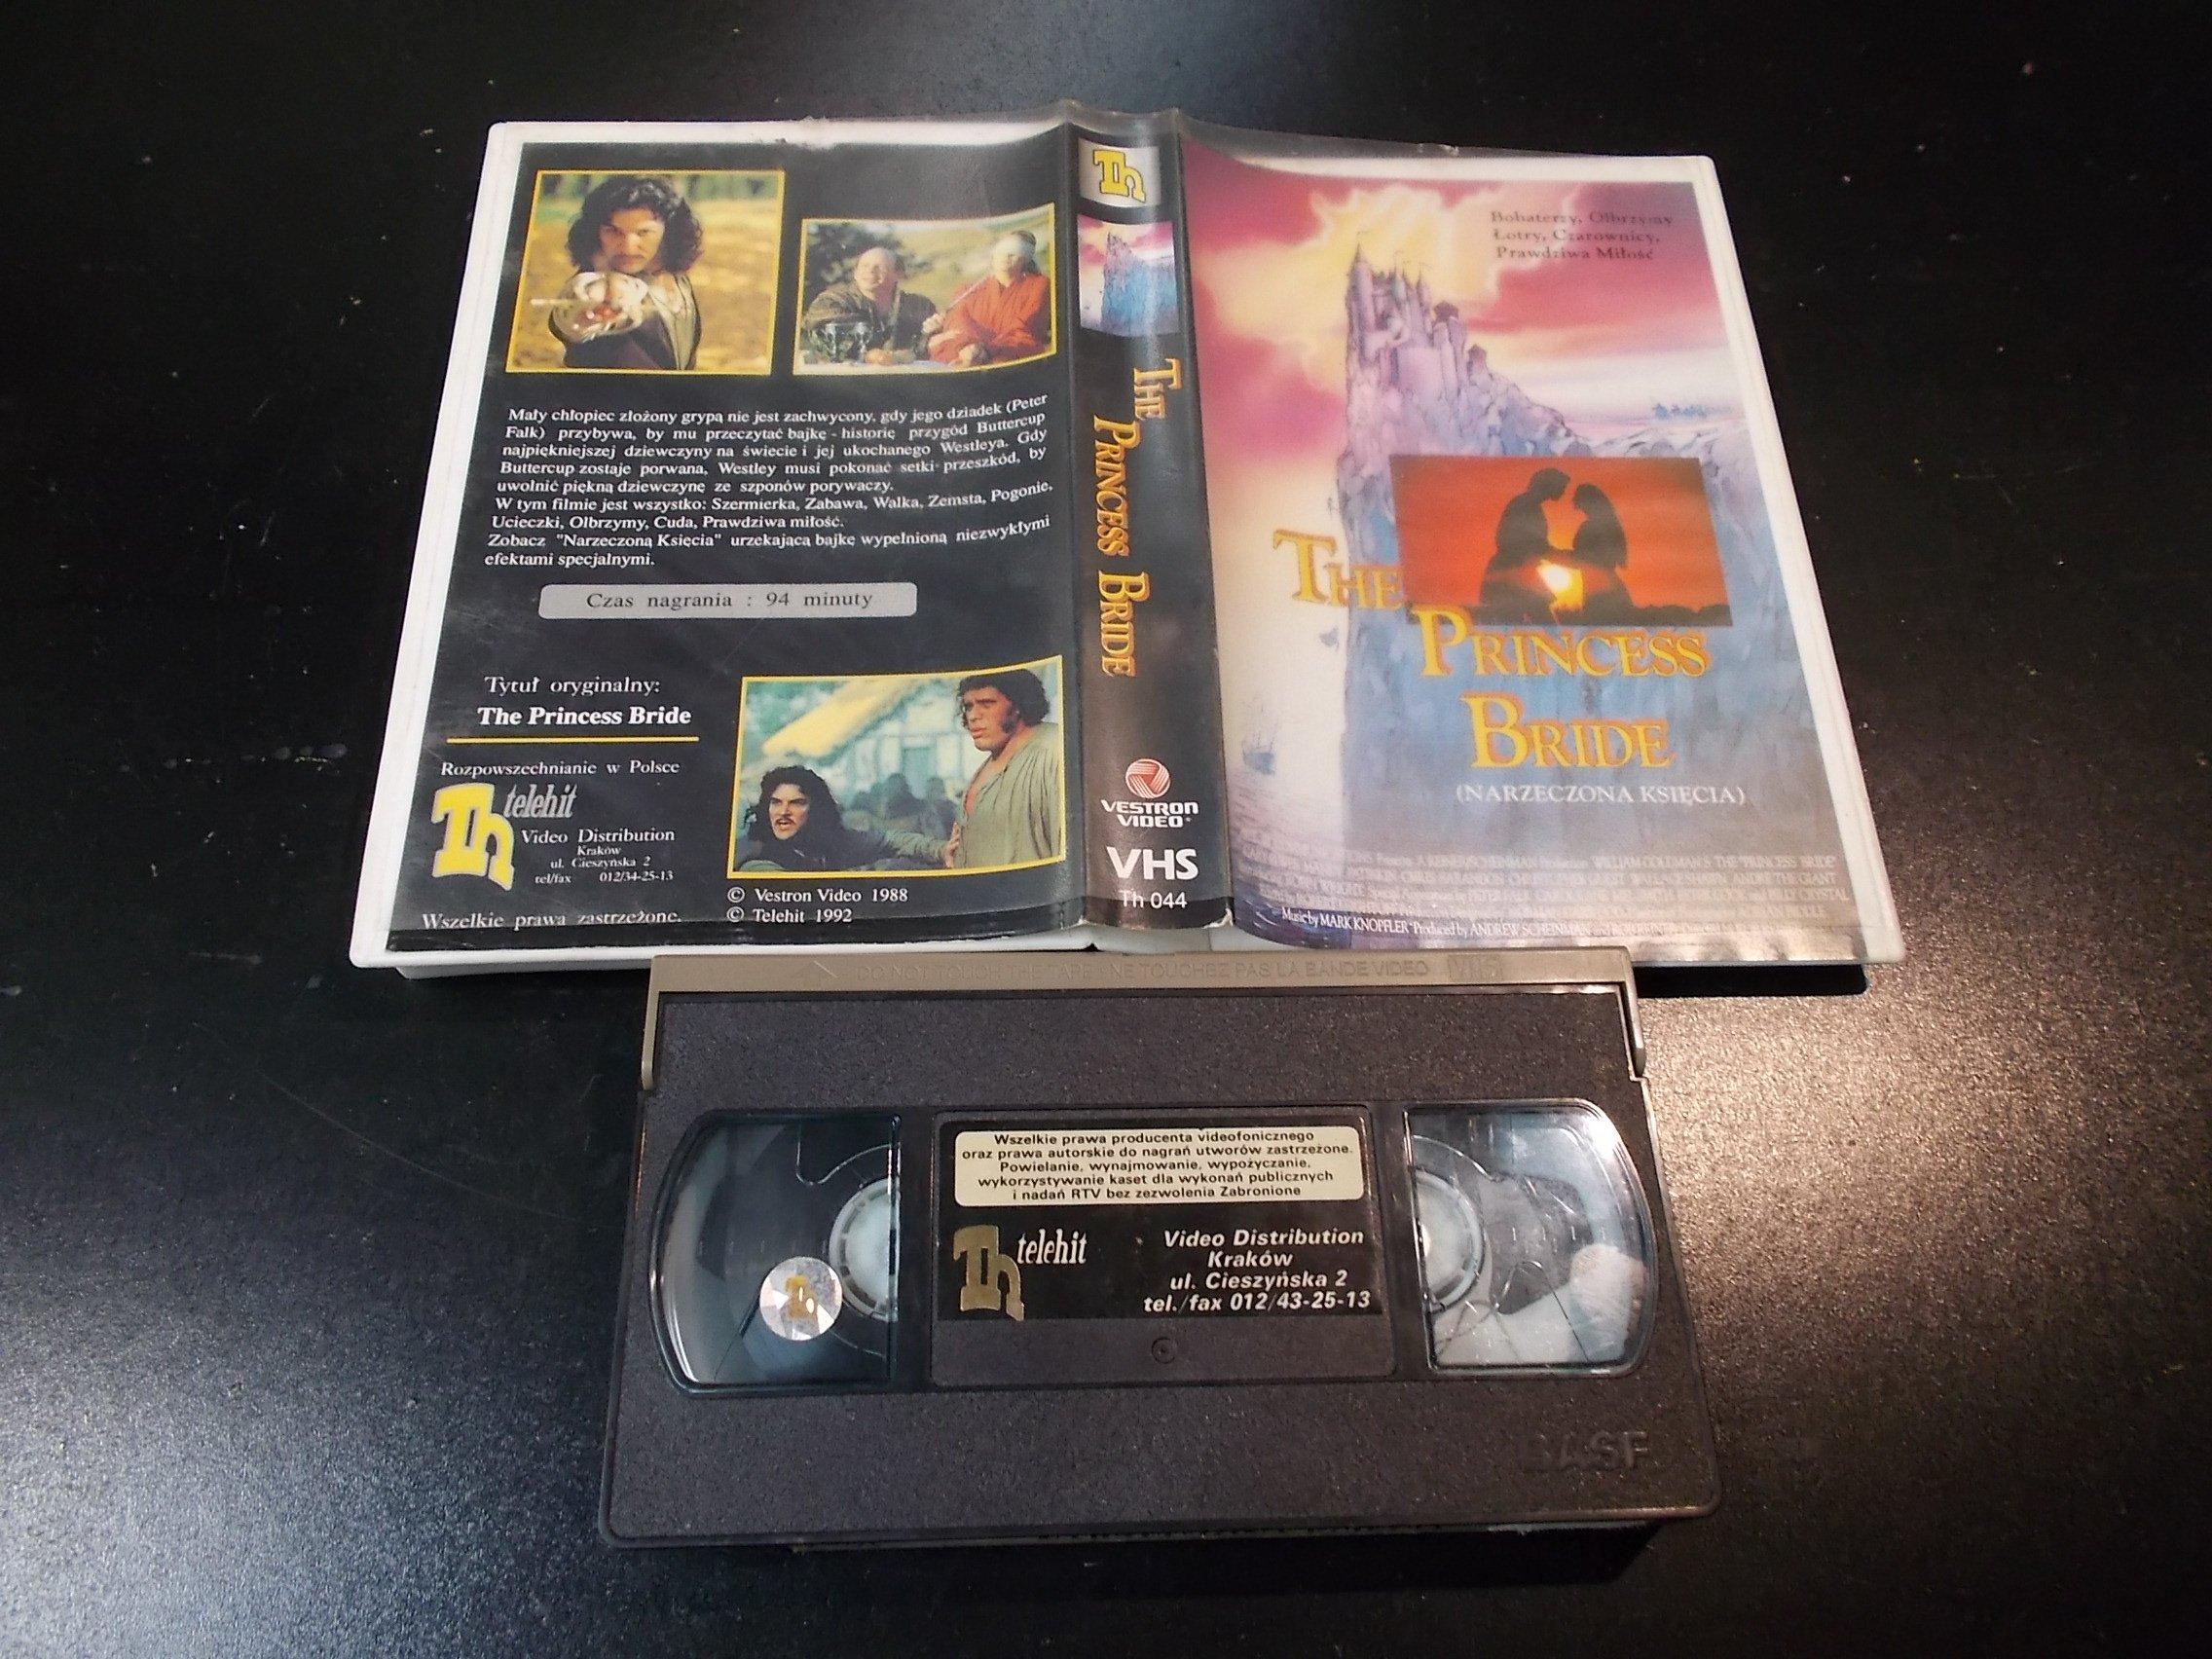 NARZECZONA KSIĘCIA - kaseta Video VHS - 1395 Sklep